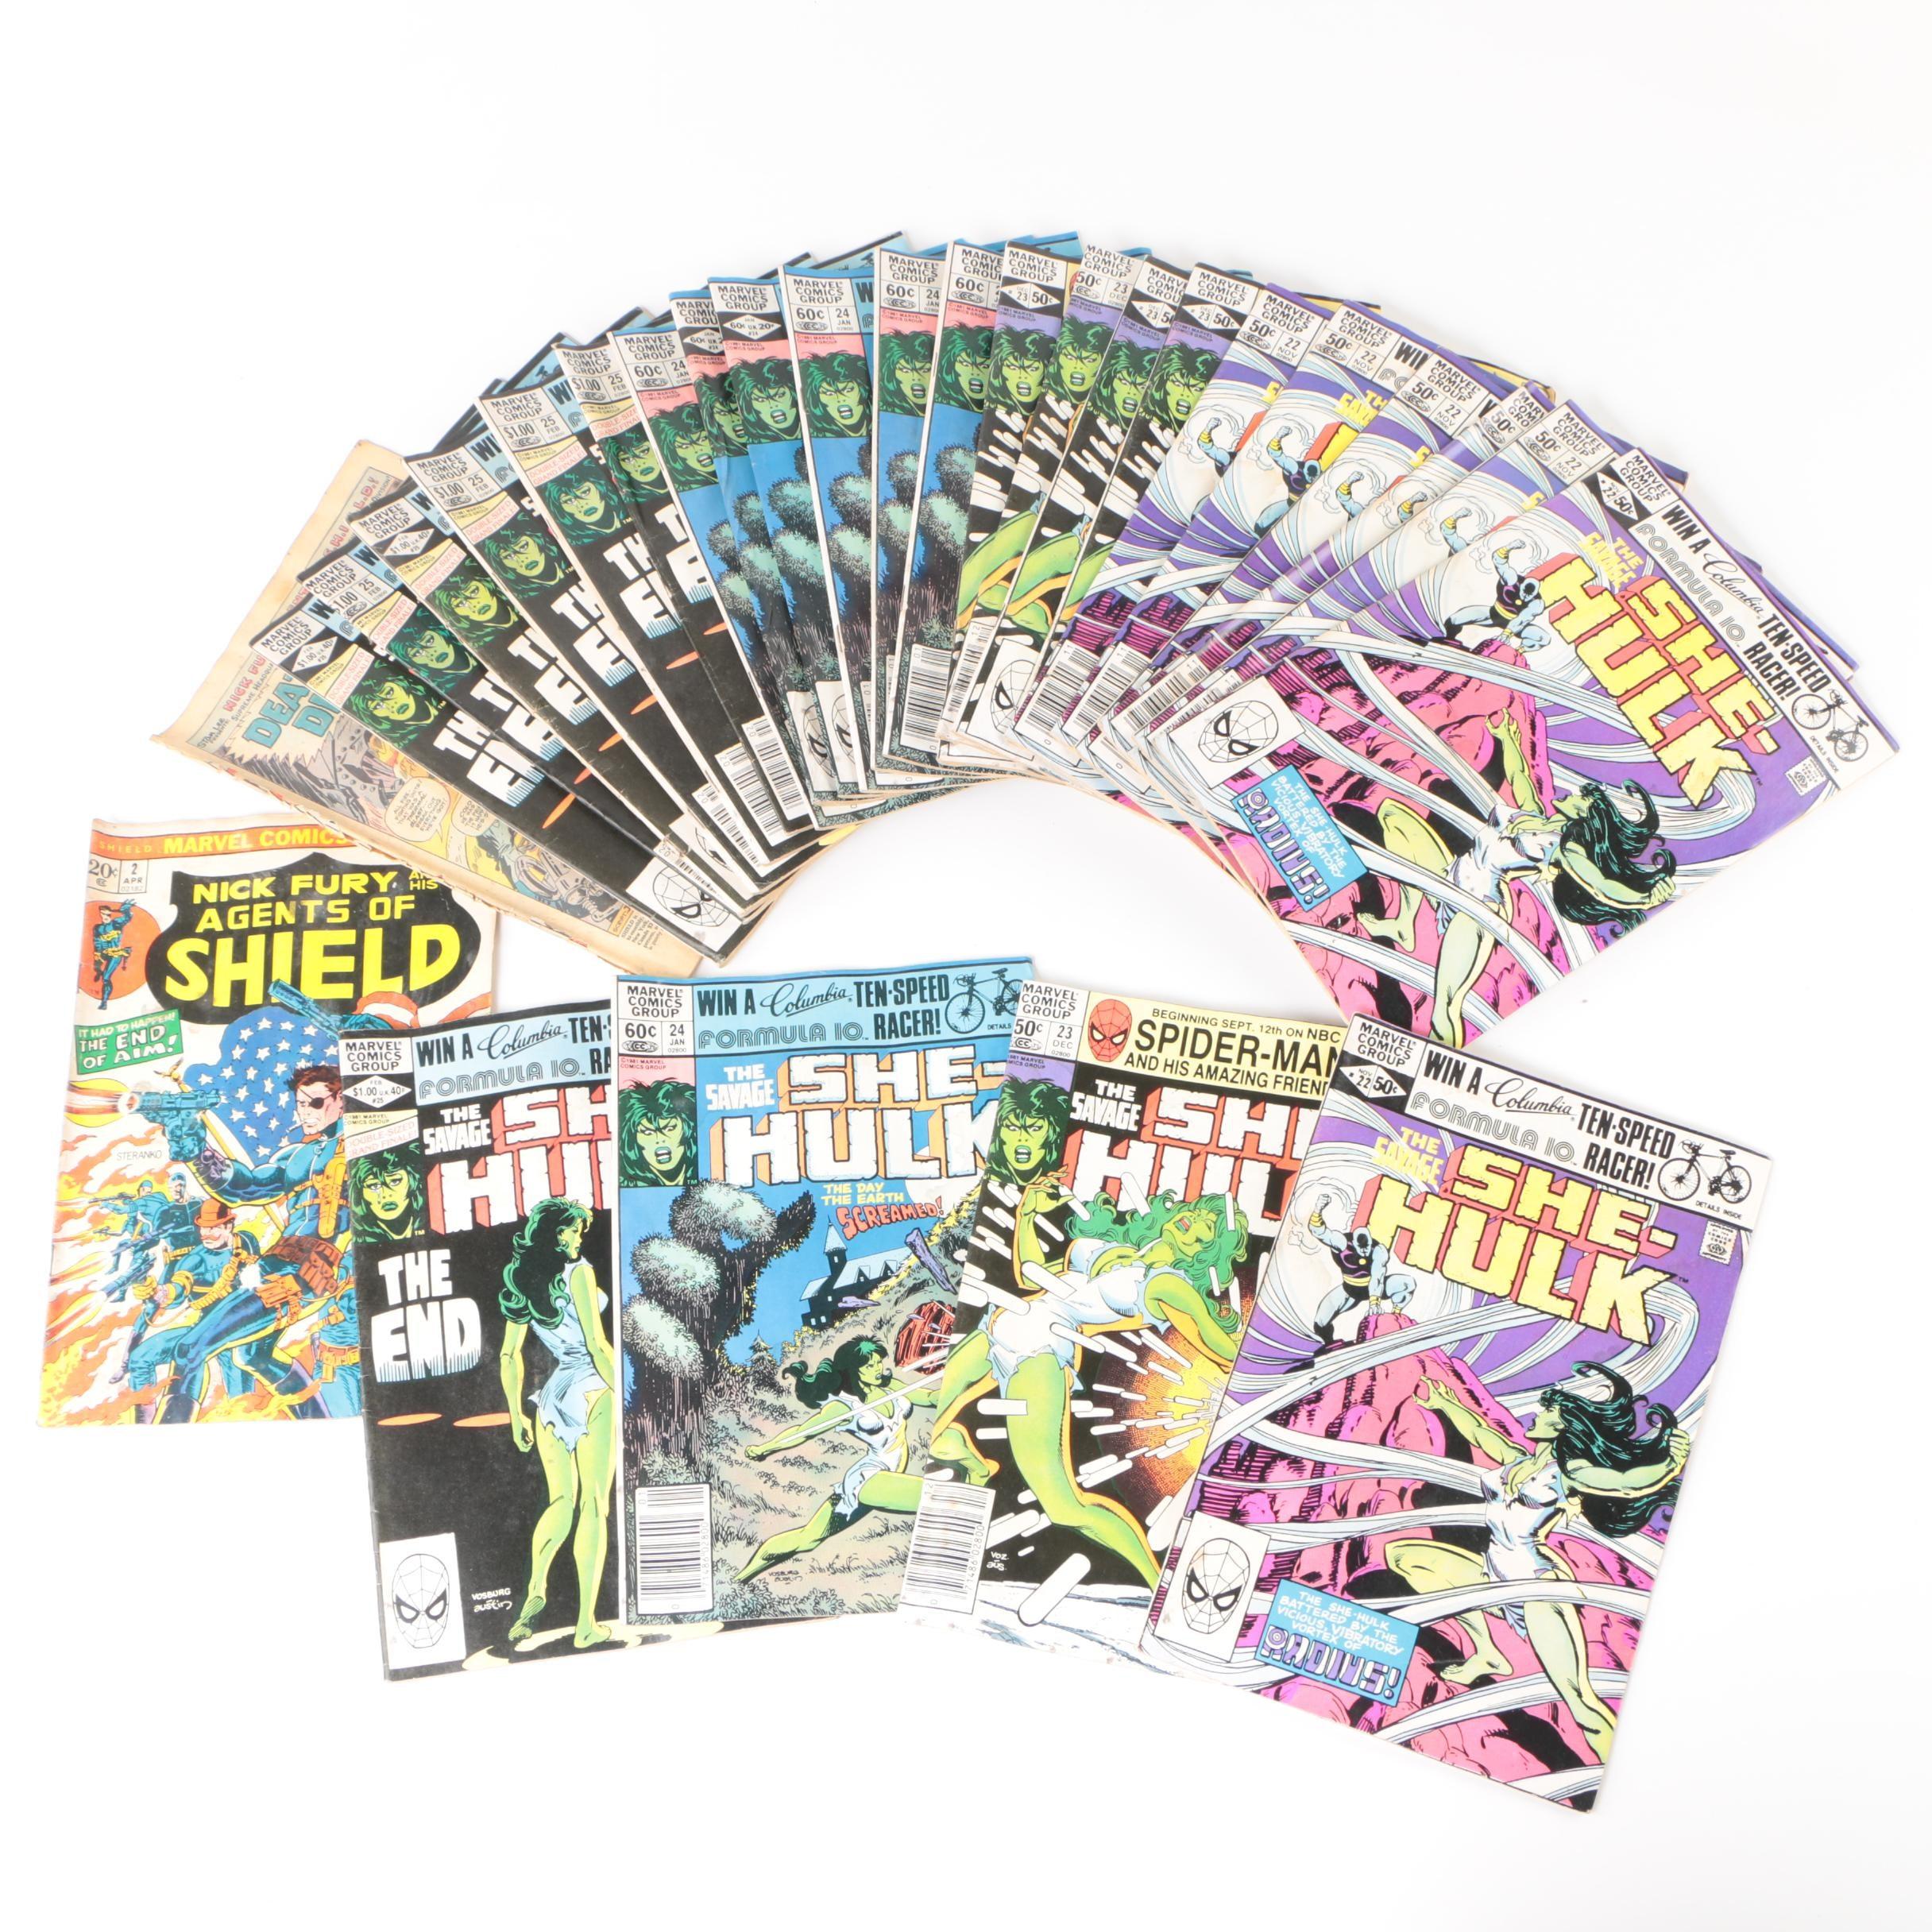 Bronze Age Marvel Comic Books featuring She-Hulk